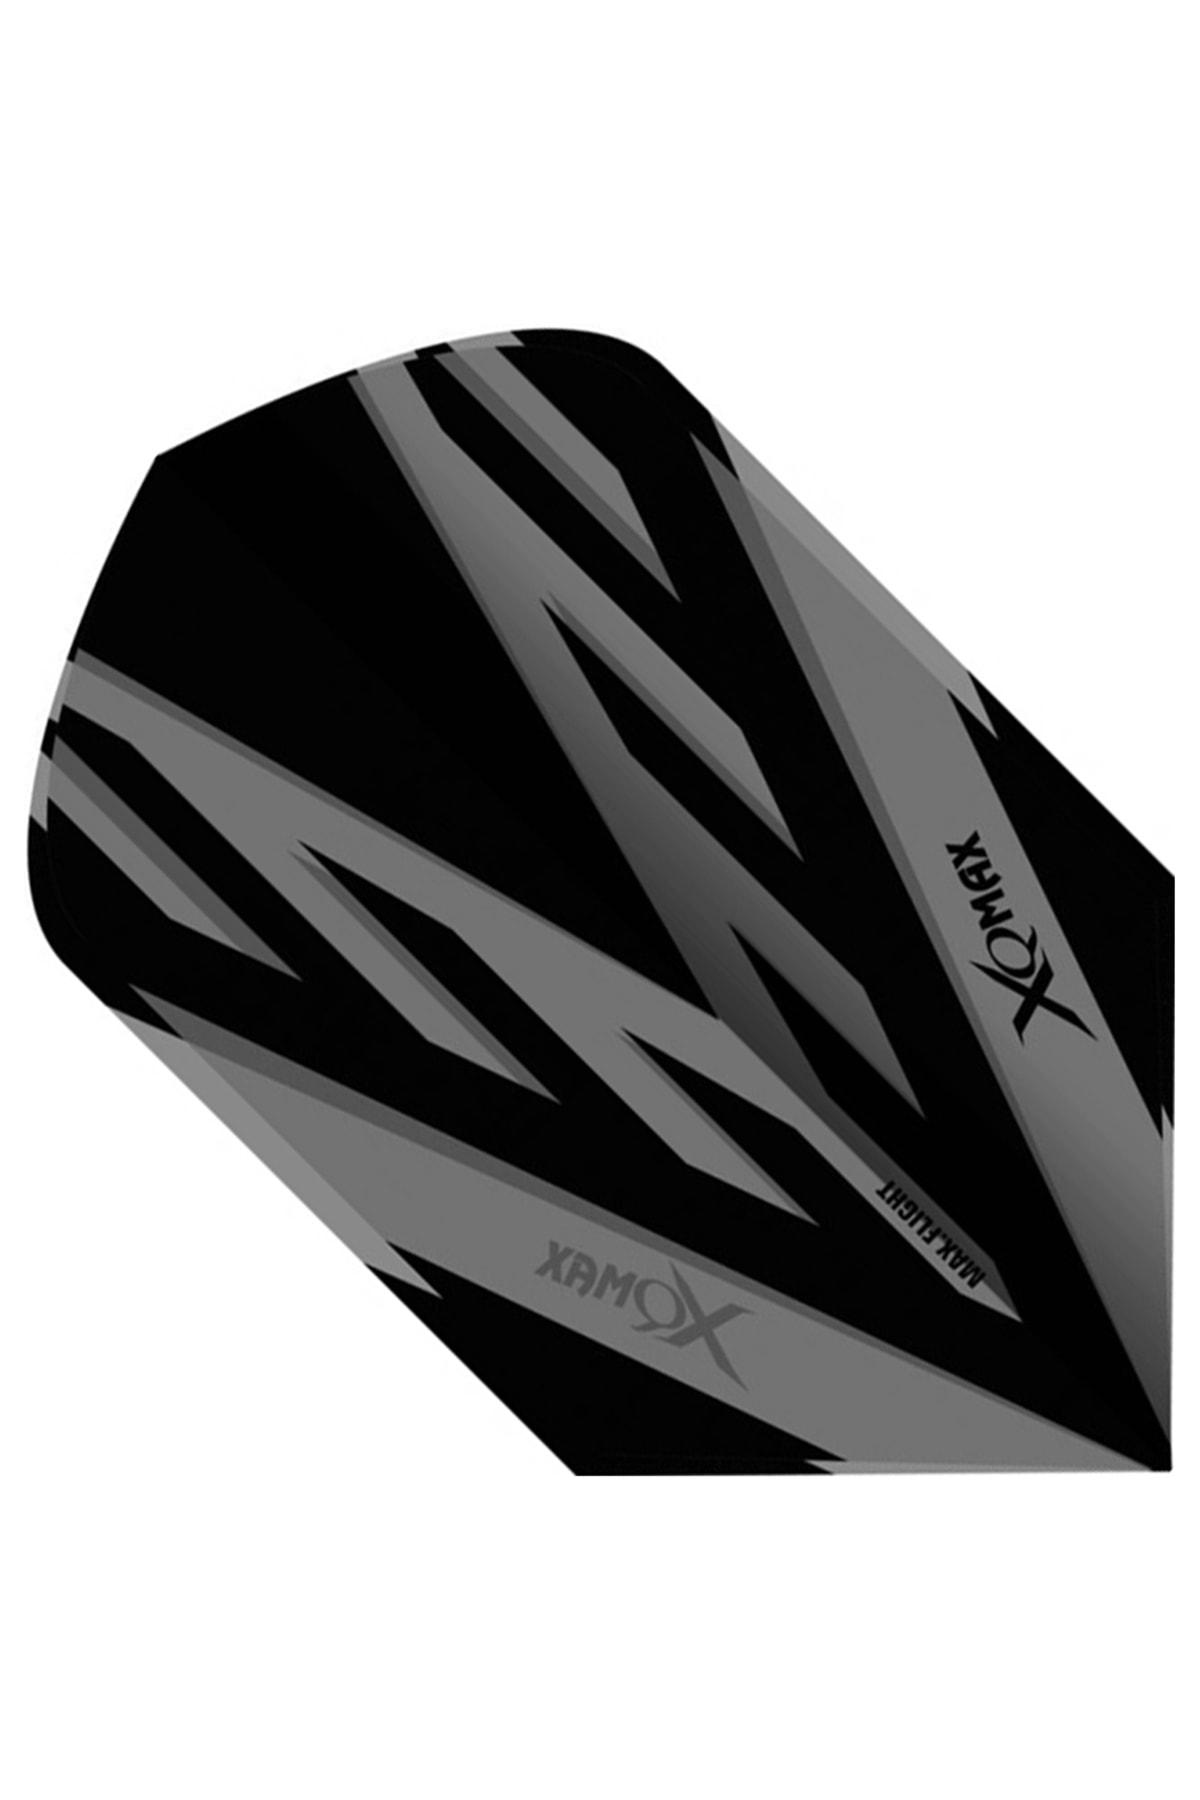 XQ Max QD7005090 3 lü Kanat Seti 0